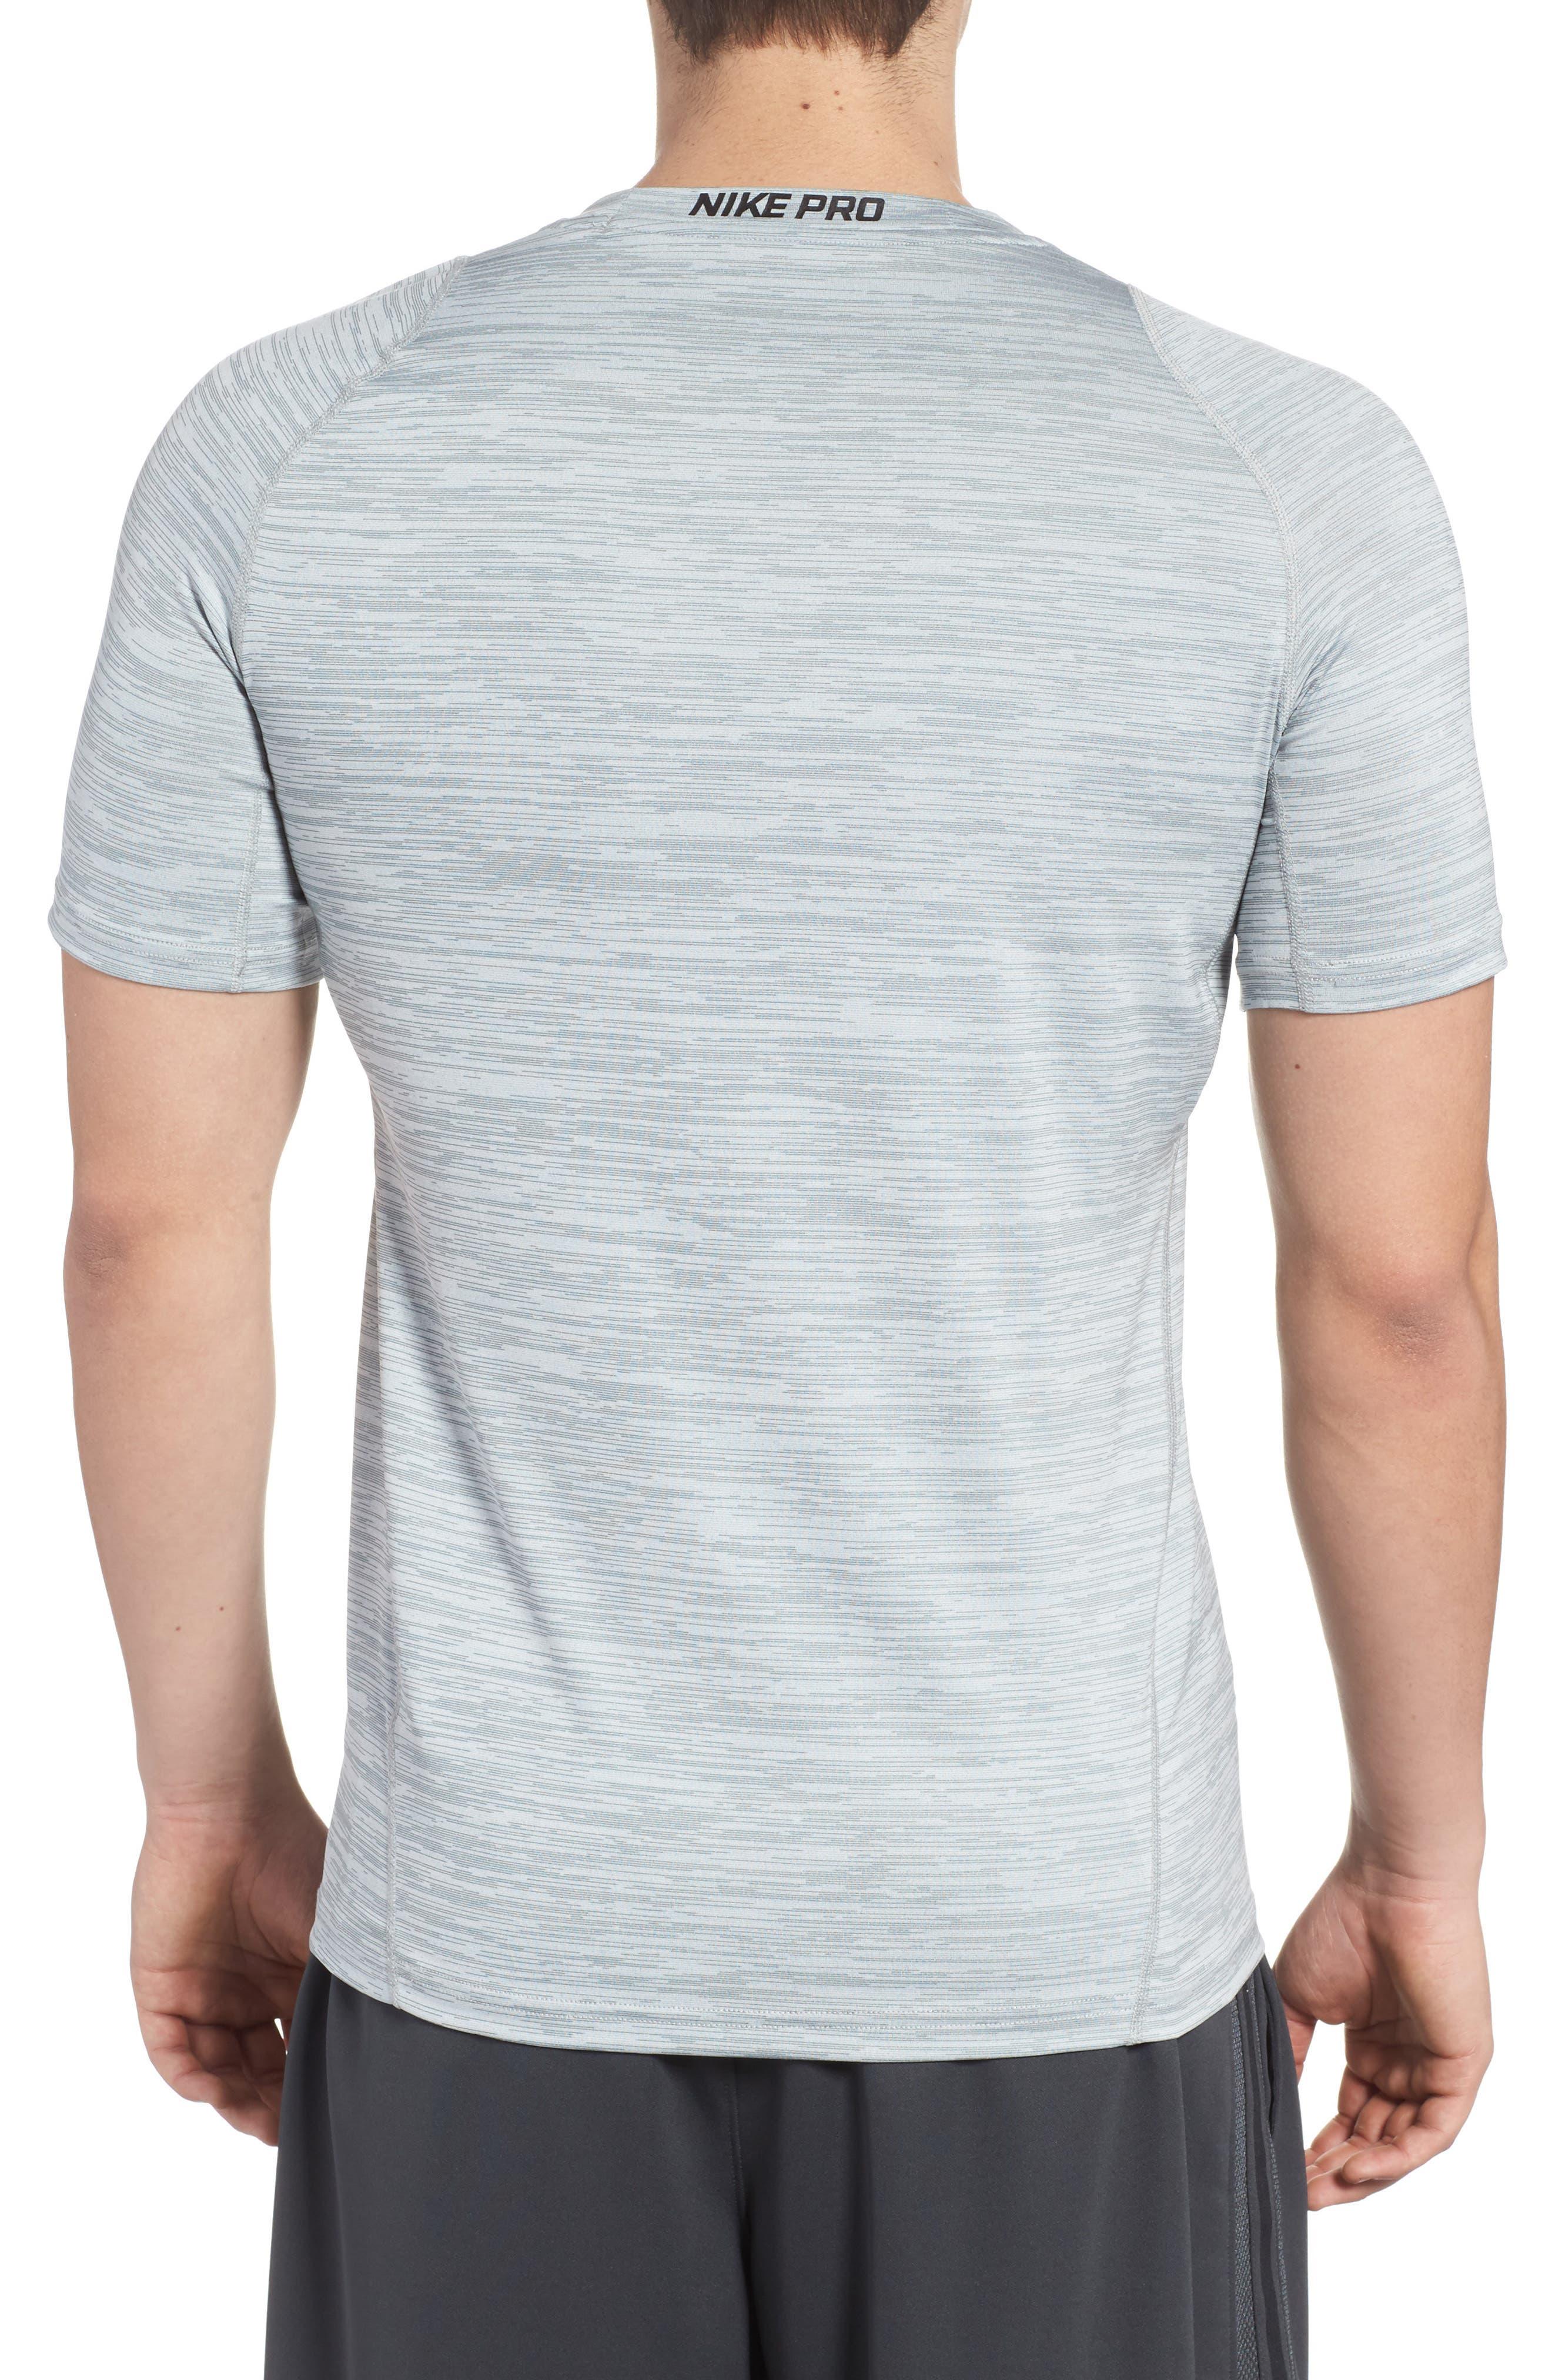 Training Top Crewneck T-Shirt,                             Alternate thumbnail 2, color,                             Cool Grey/ White/ Black